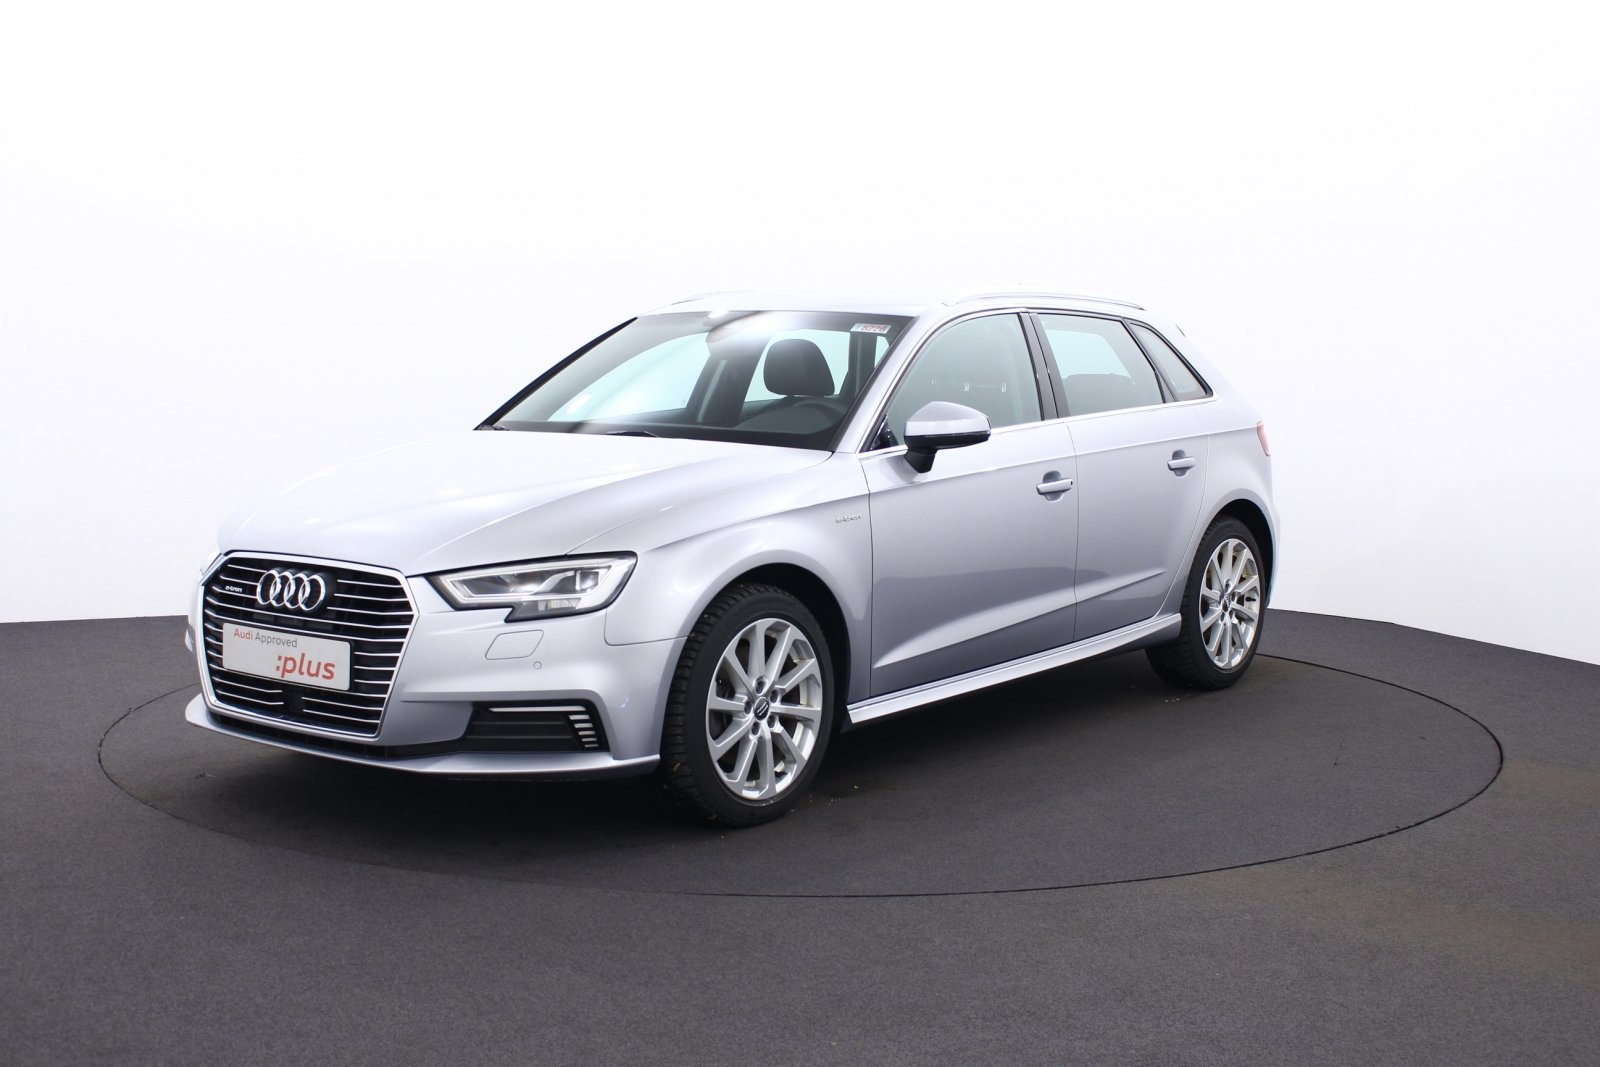 Audi – A3 Sportback e-tron – Design